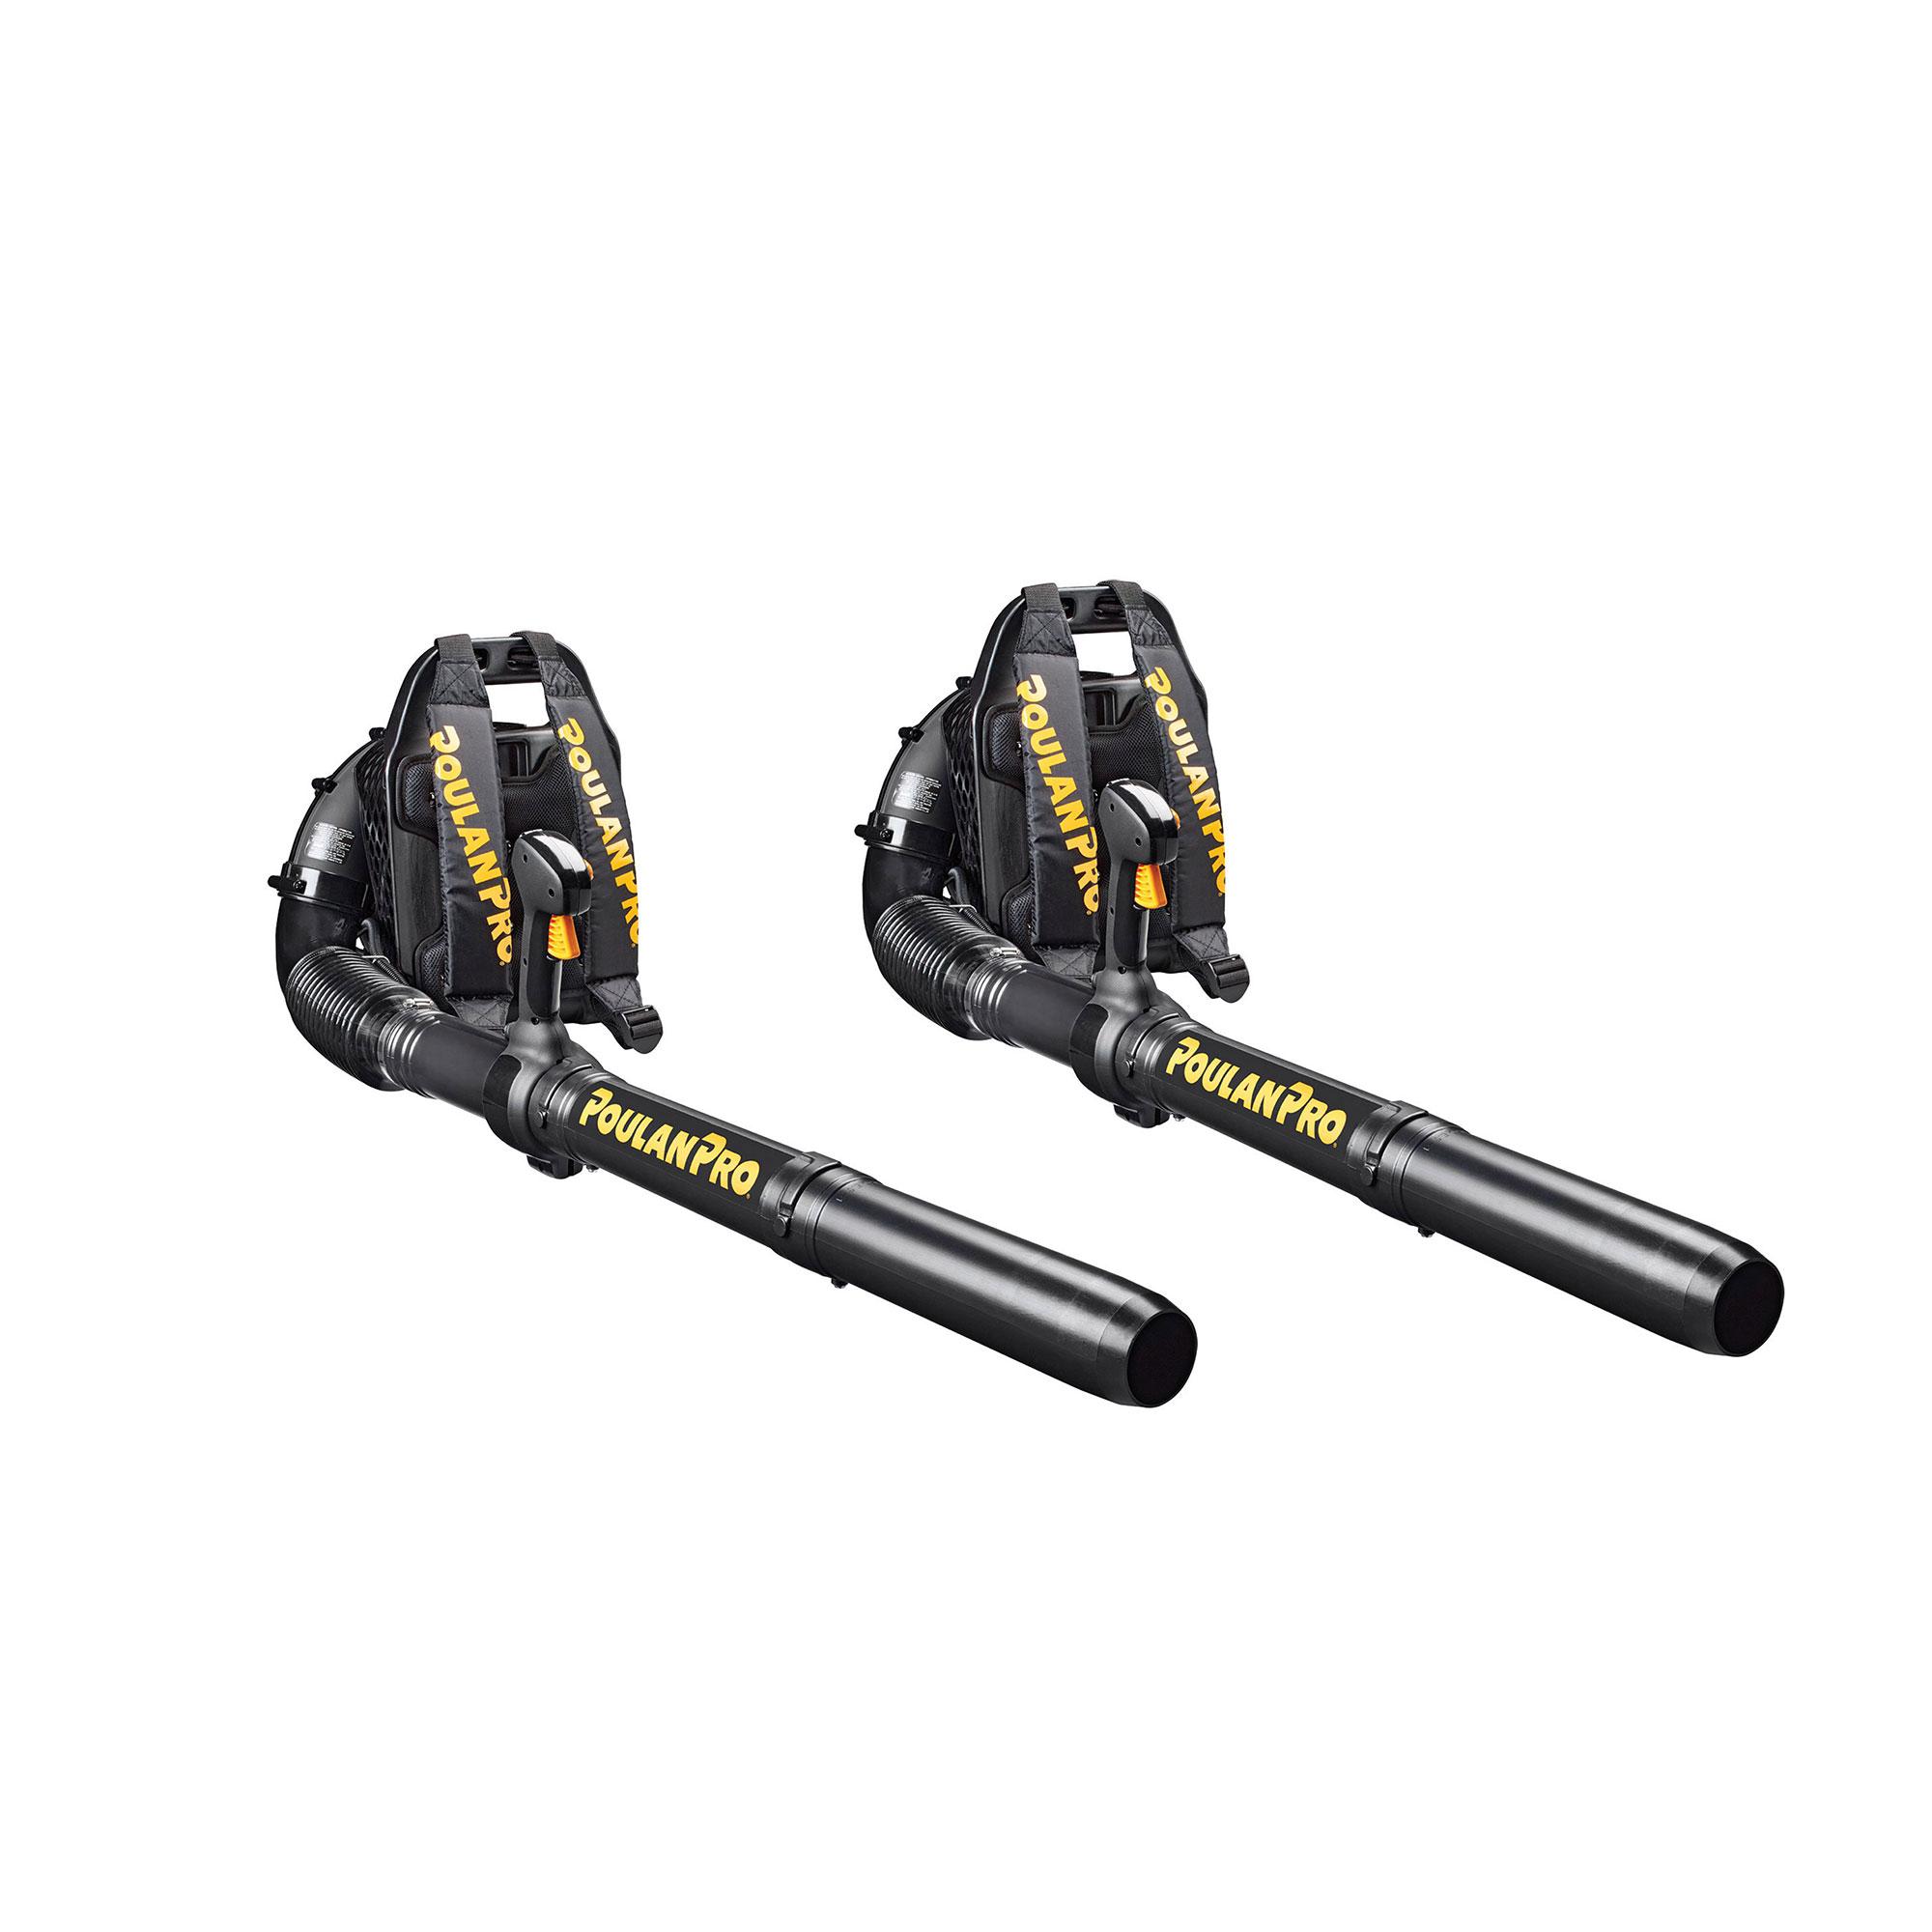 Poulan Pro 46cc Gas Backpack Yard Leaf Blower (2 Pack) (Certified Refurbished)